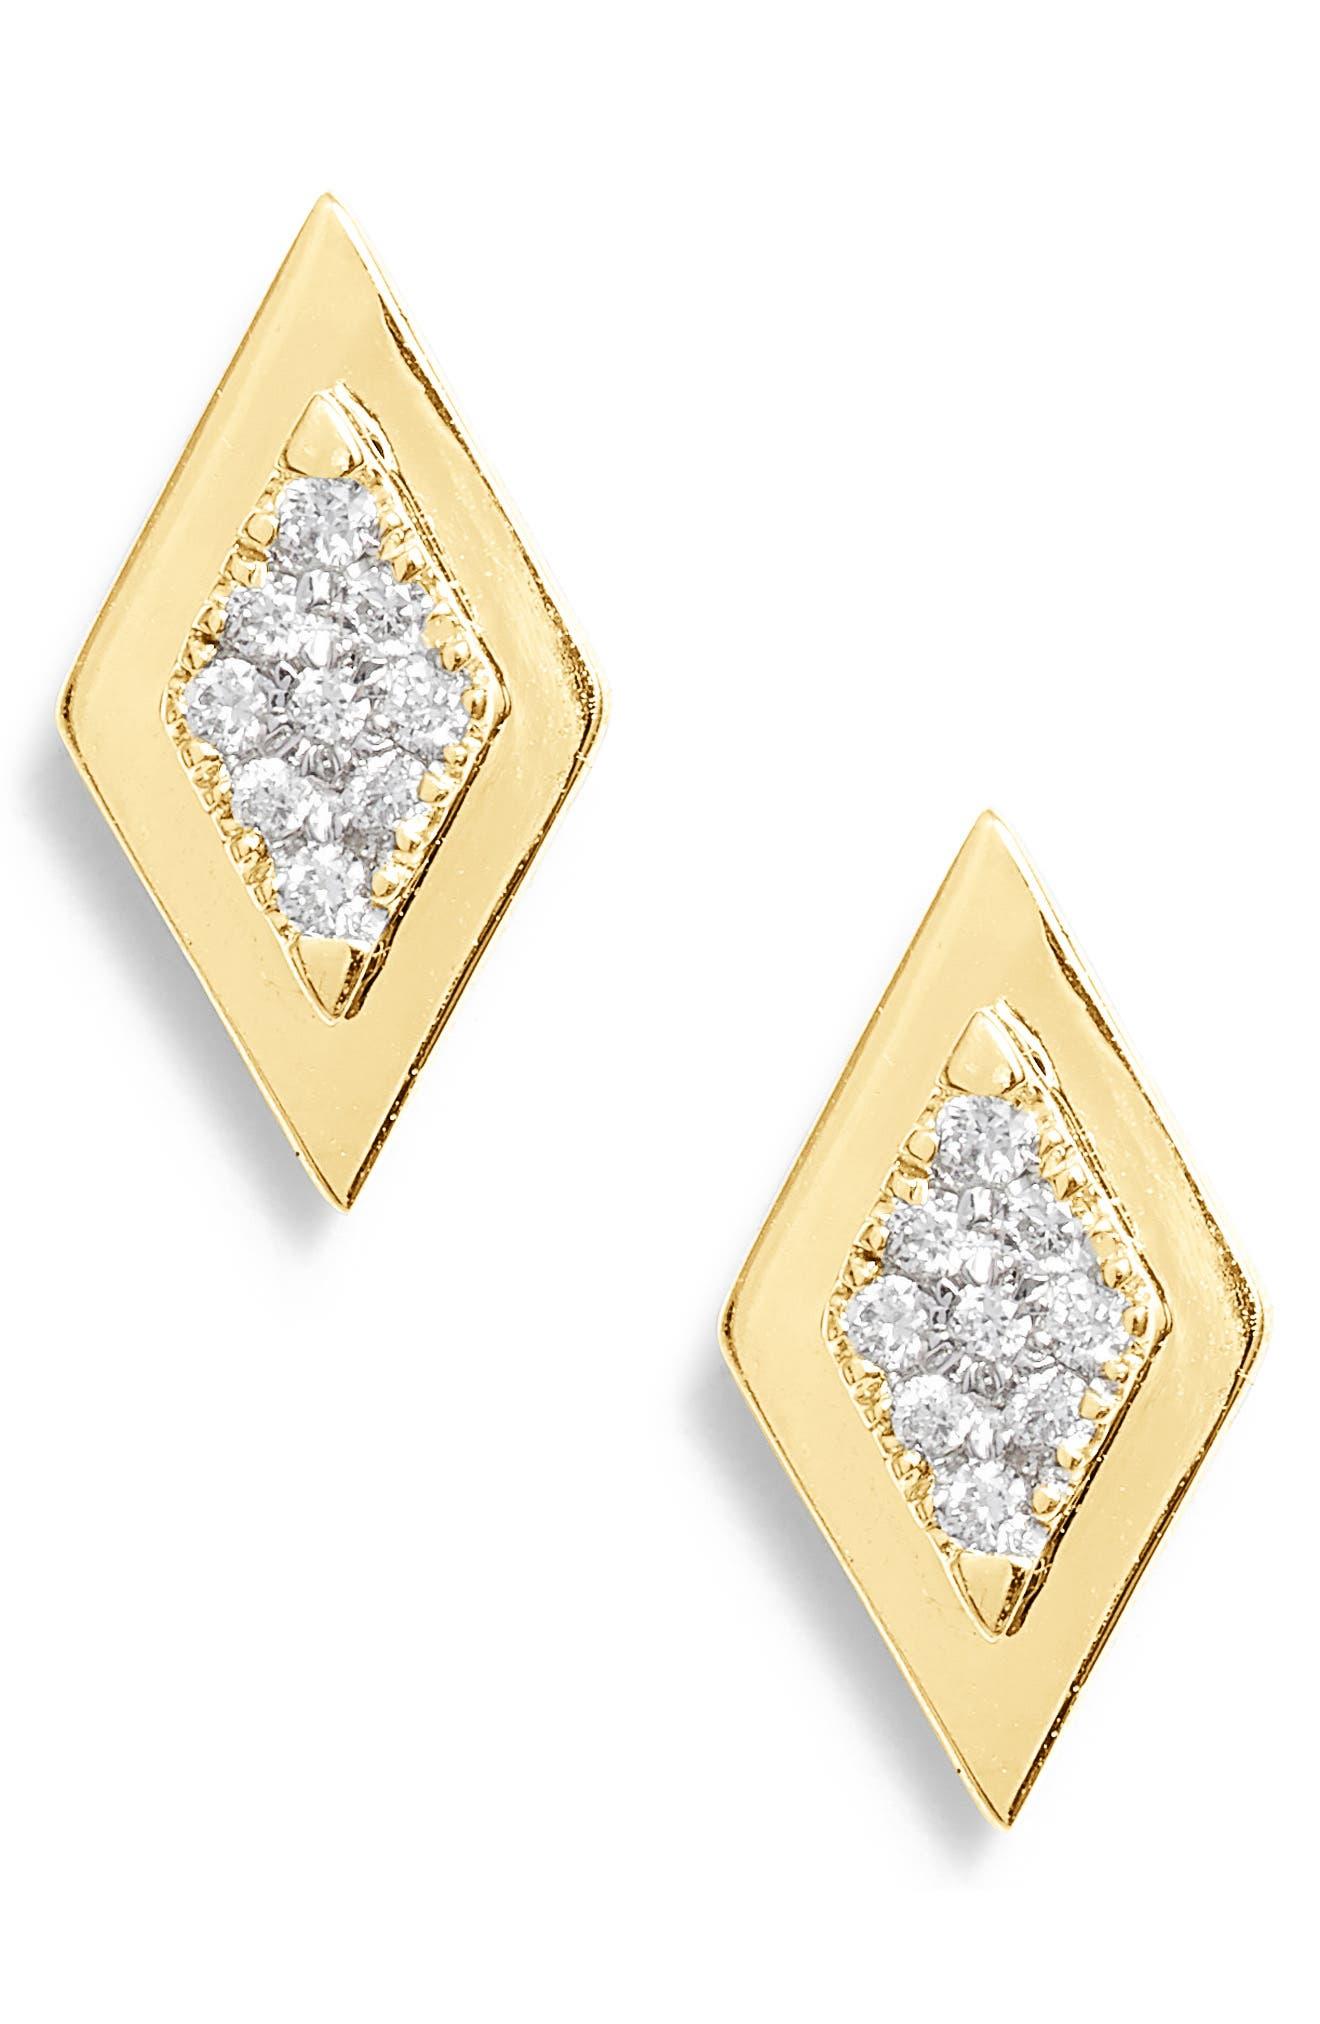 DANA REBECCA DESIGNS,                             Dana Rebecca Lisa Michelle Multi Diamond Stud Earrings,                             Main thumbnail 1, color,                             710